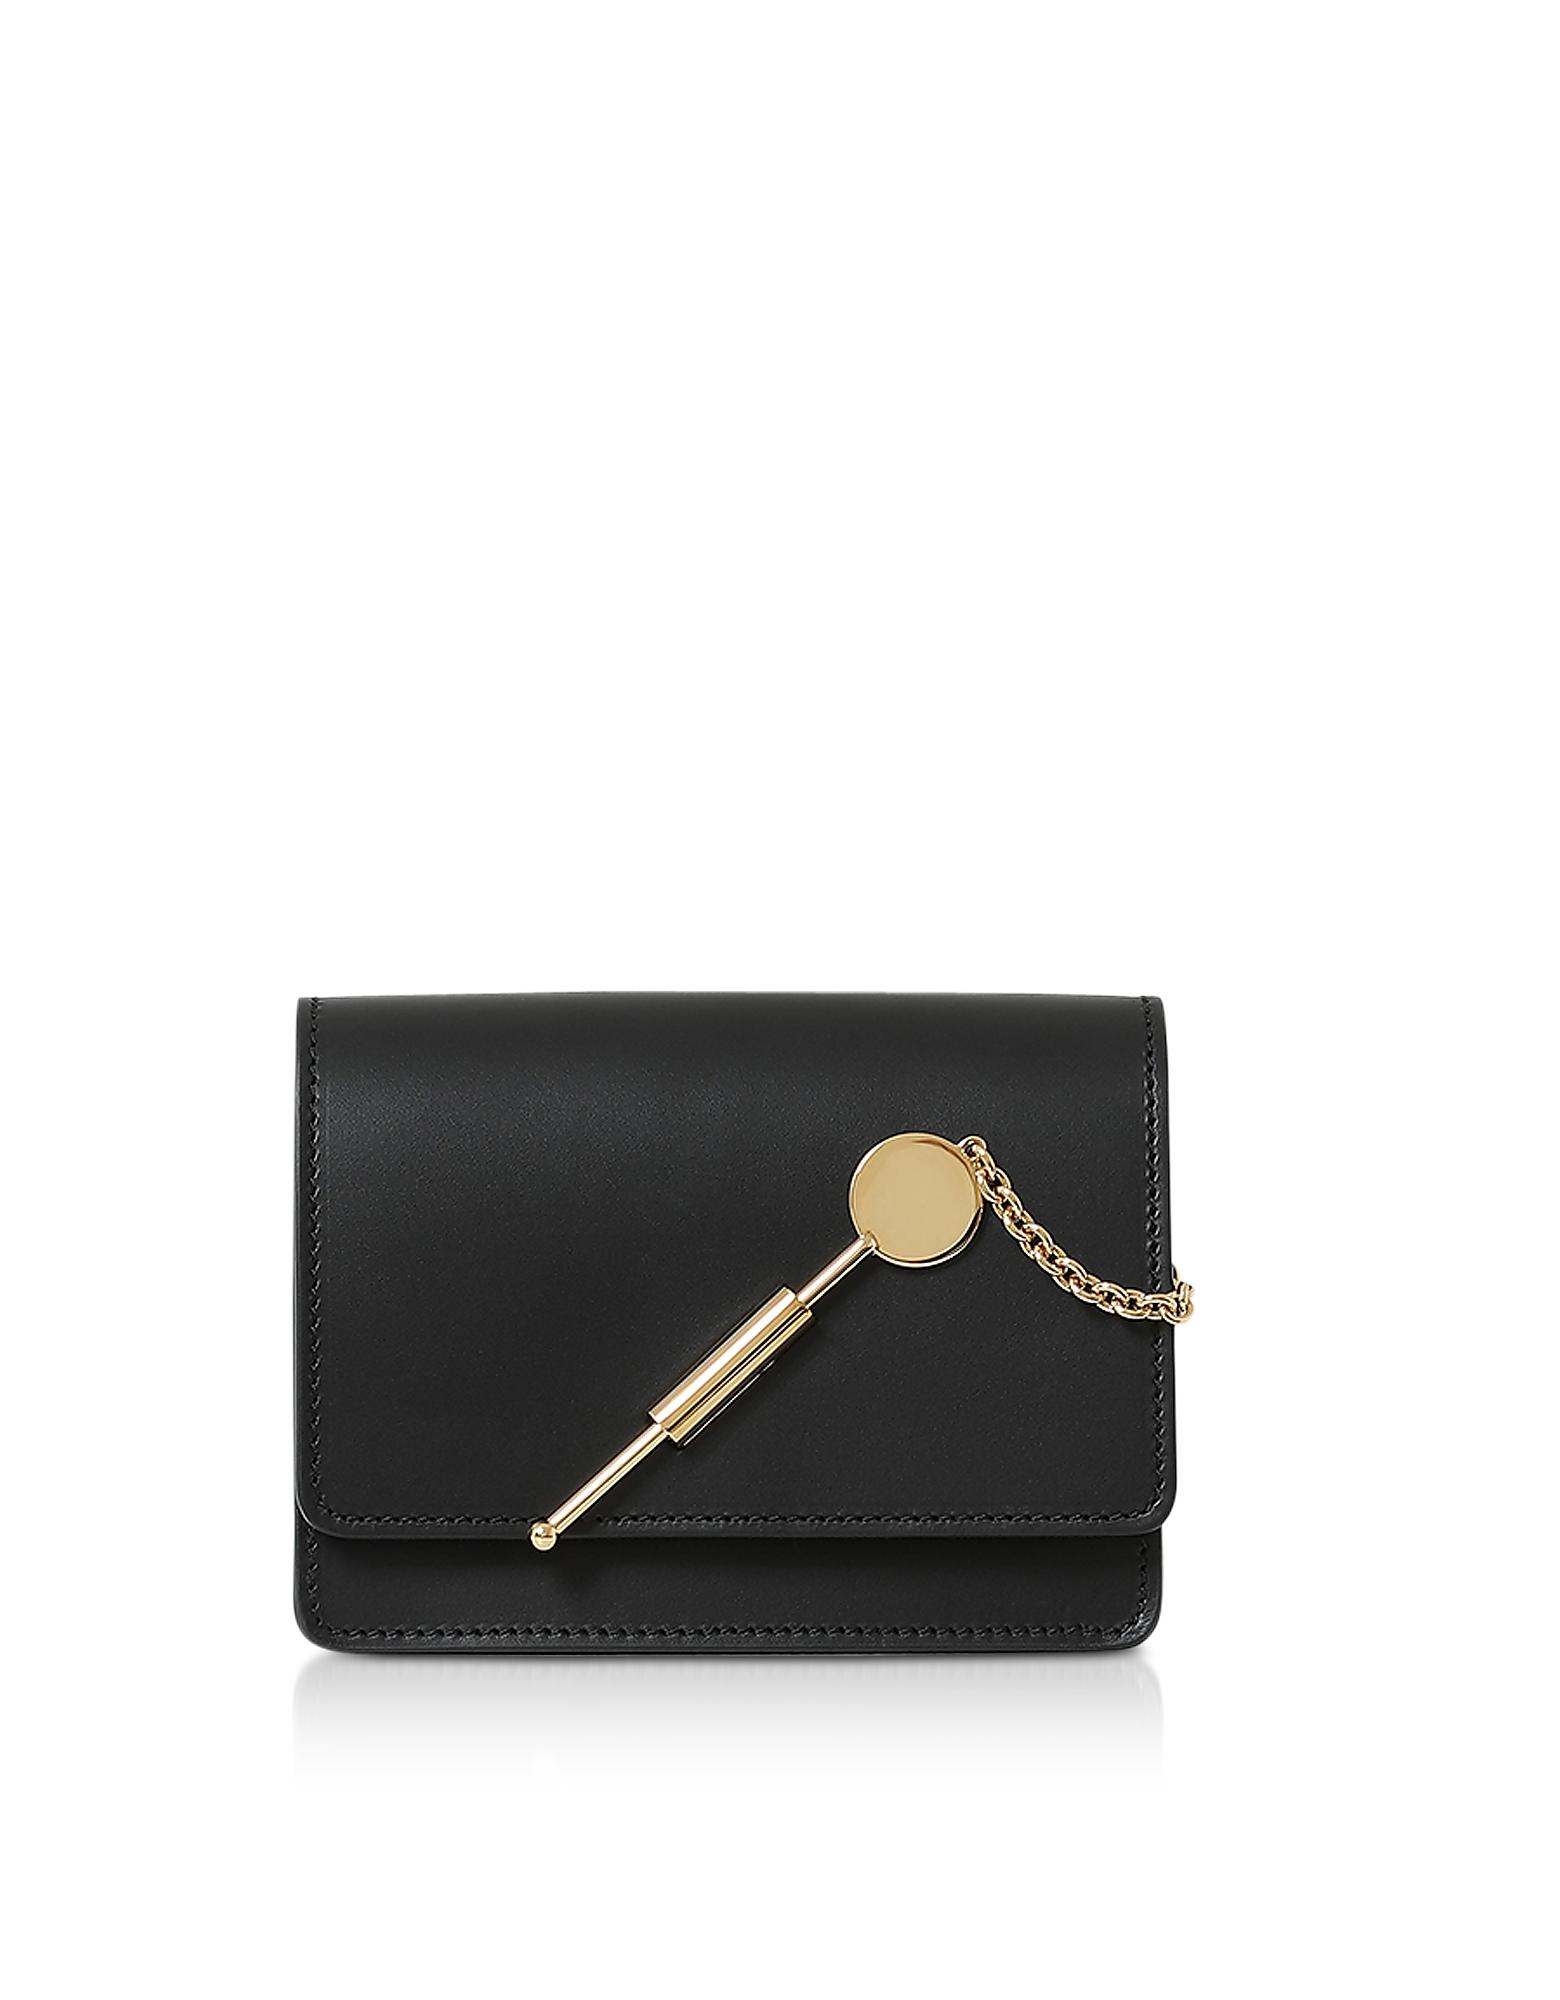 SOPHIE HULME | Sophie Hulme Designer Handbags, Micro Cocktail Stirrer Bag | Goxip